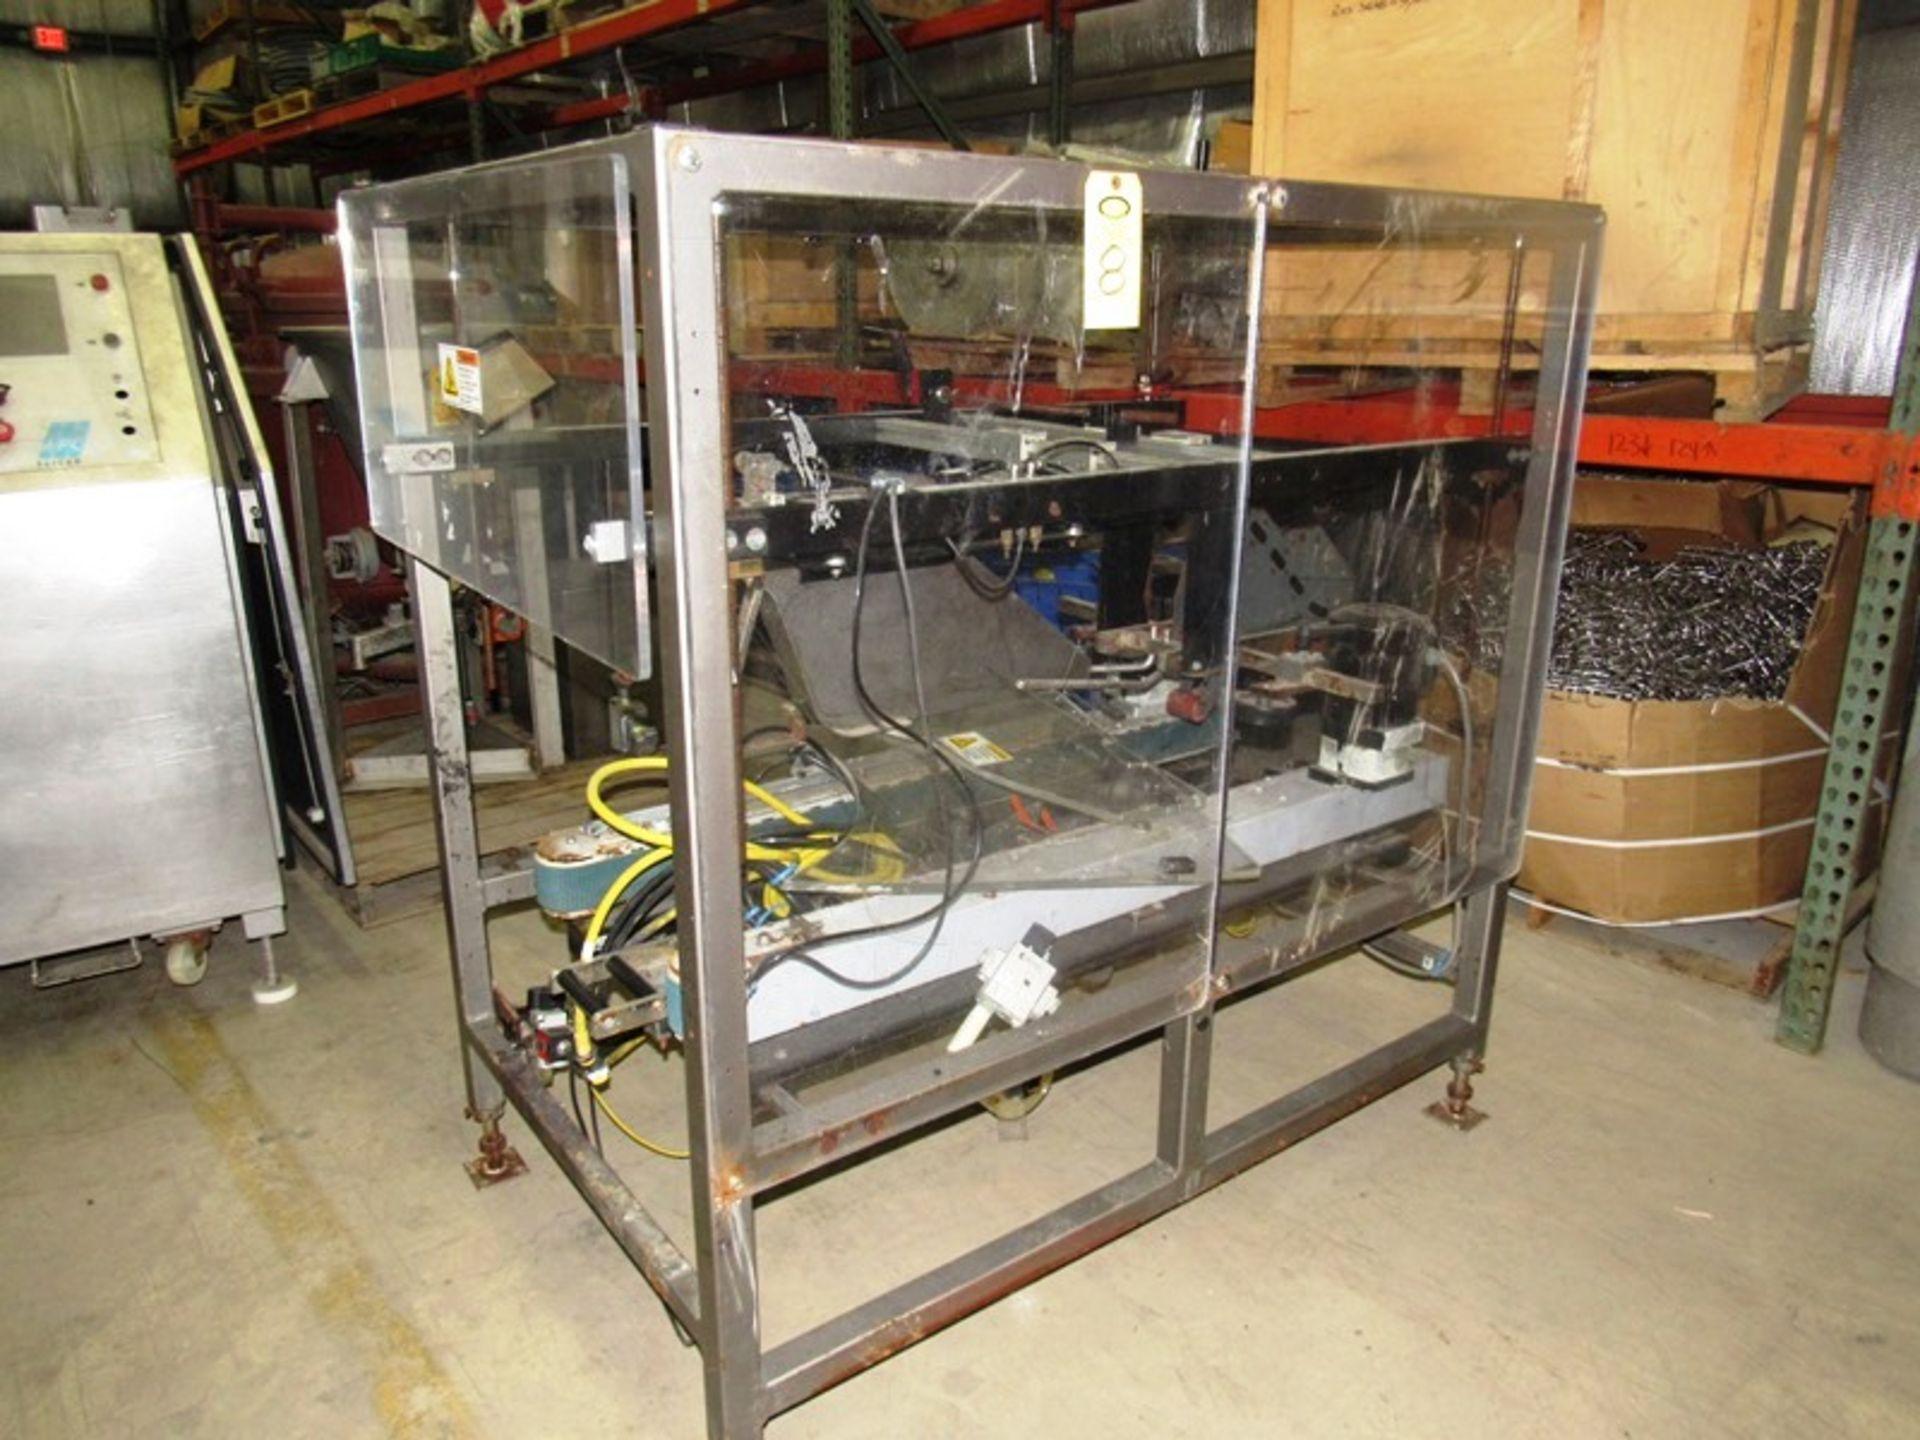 Lot 8 - Combi Mdl. TB1 Automatic Top & Bottom Case Sealer, Ser. #TB1190266, 460 volts